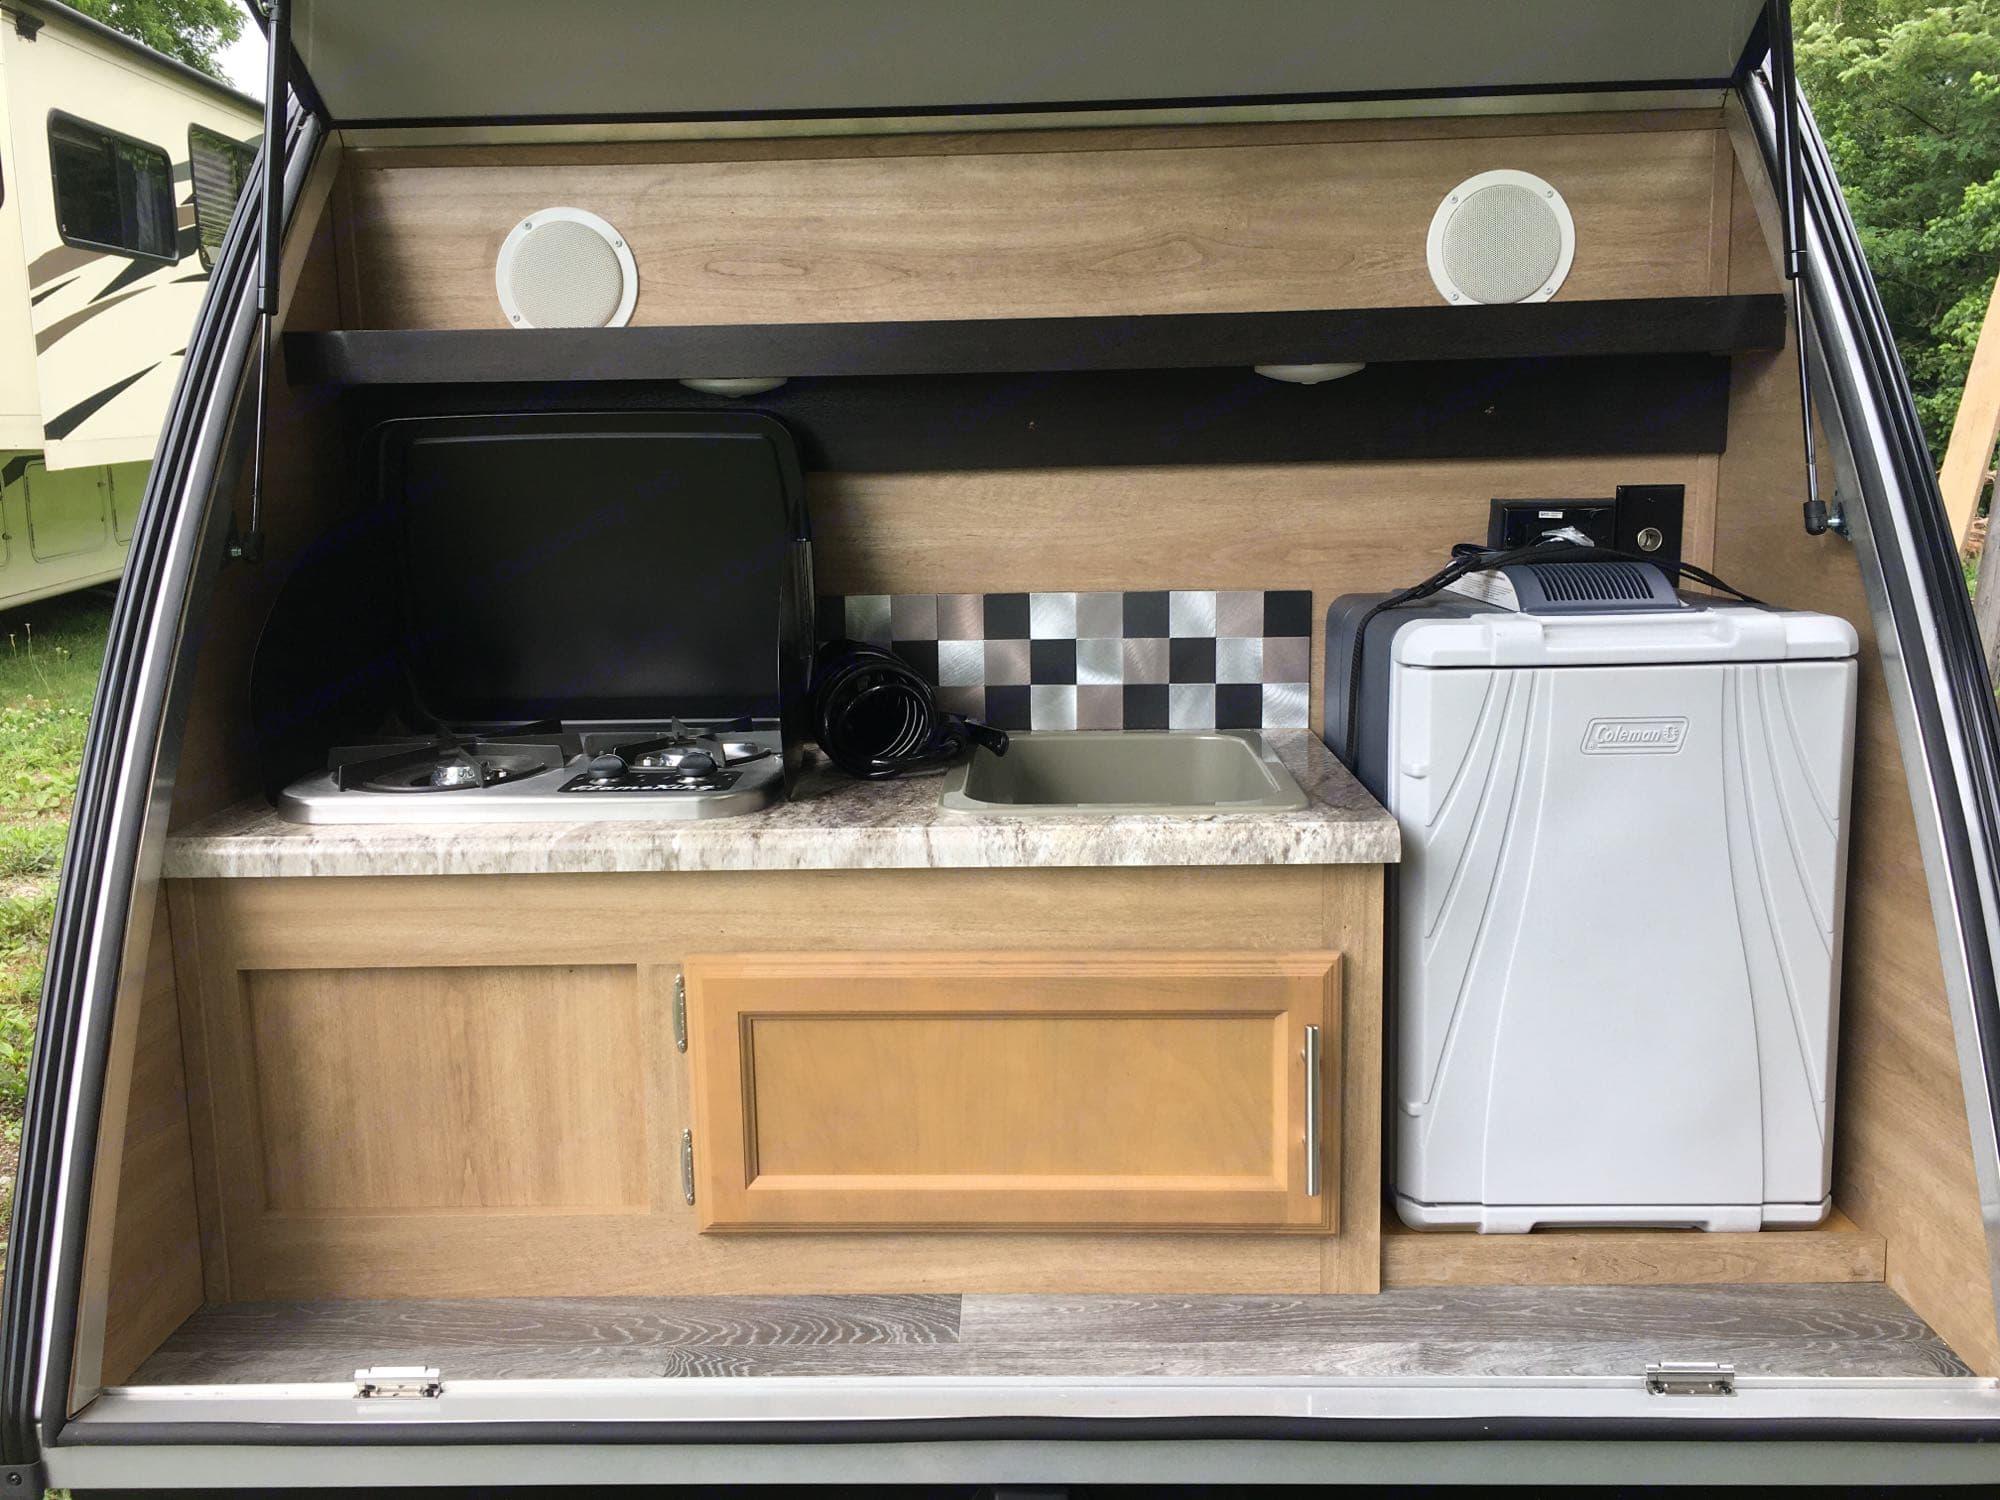 Cook top, sink, and refrigerator. Braxton Creek Bushwhacker 2020